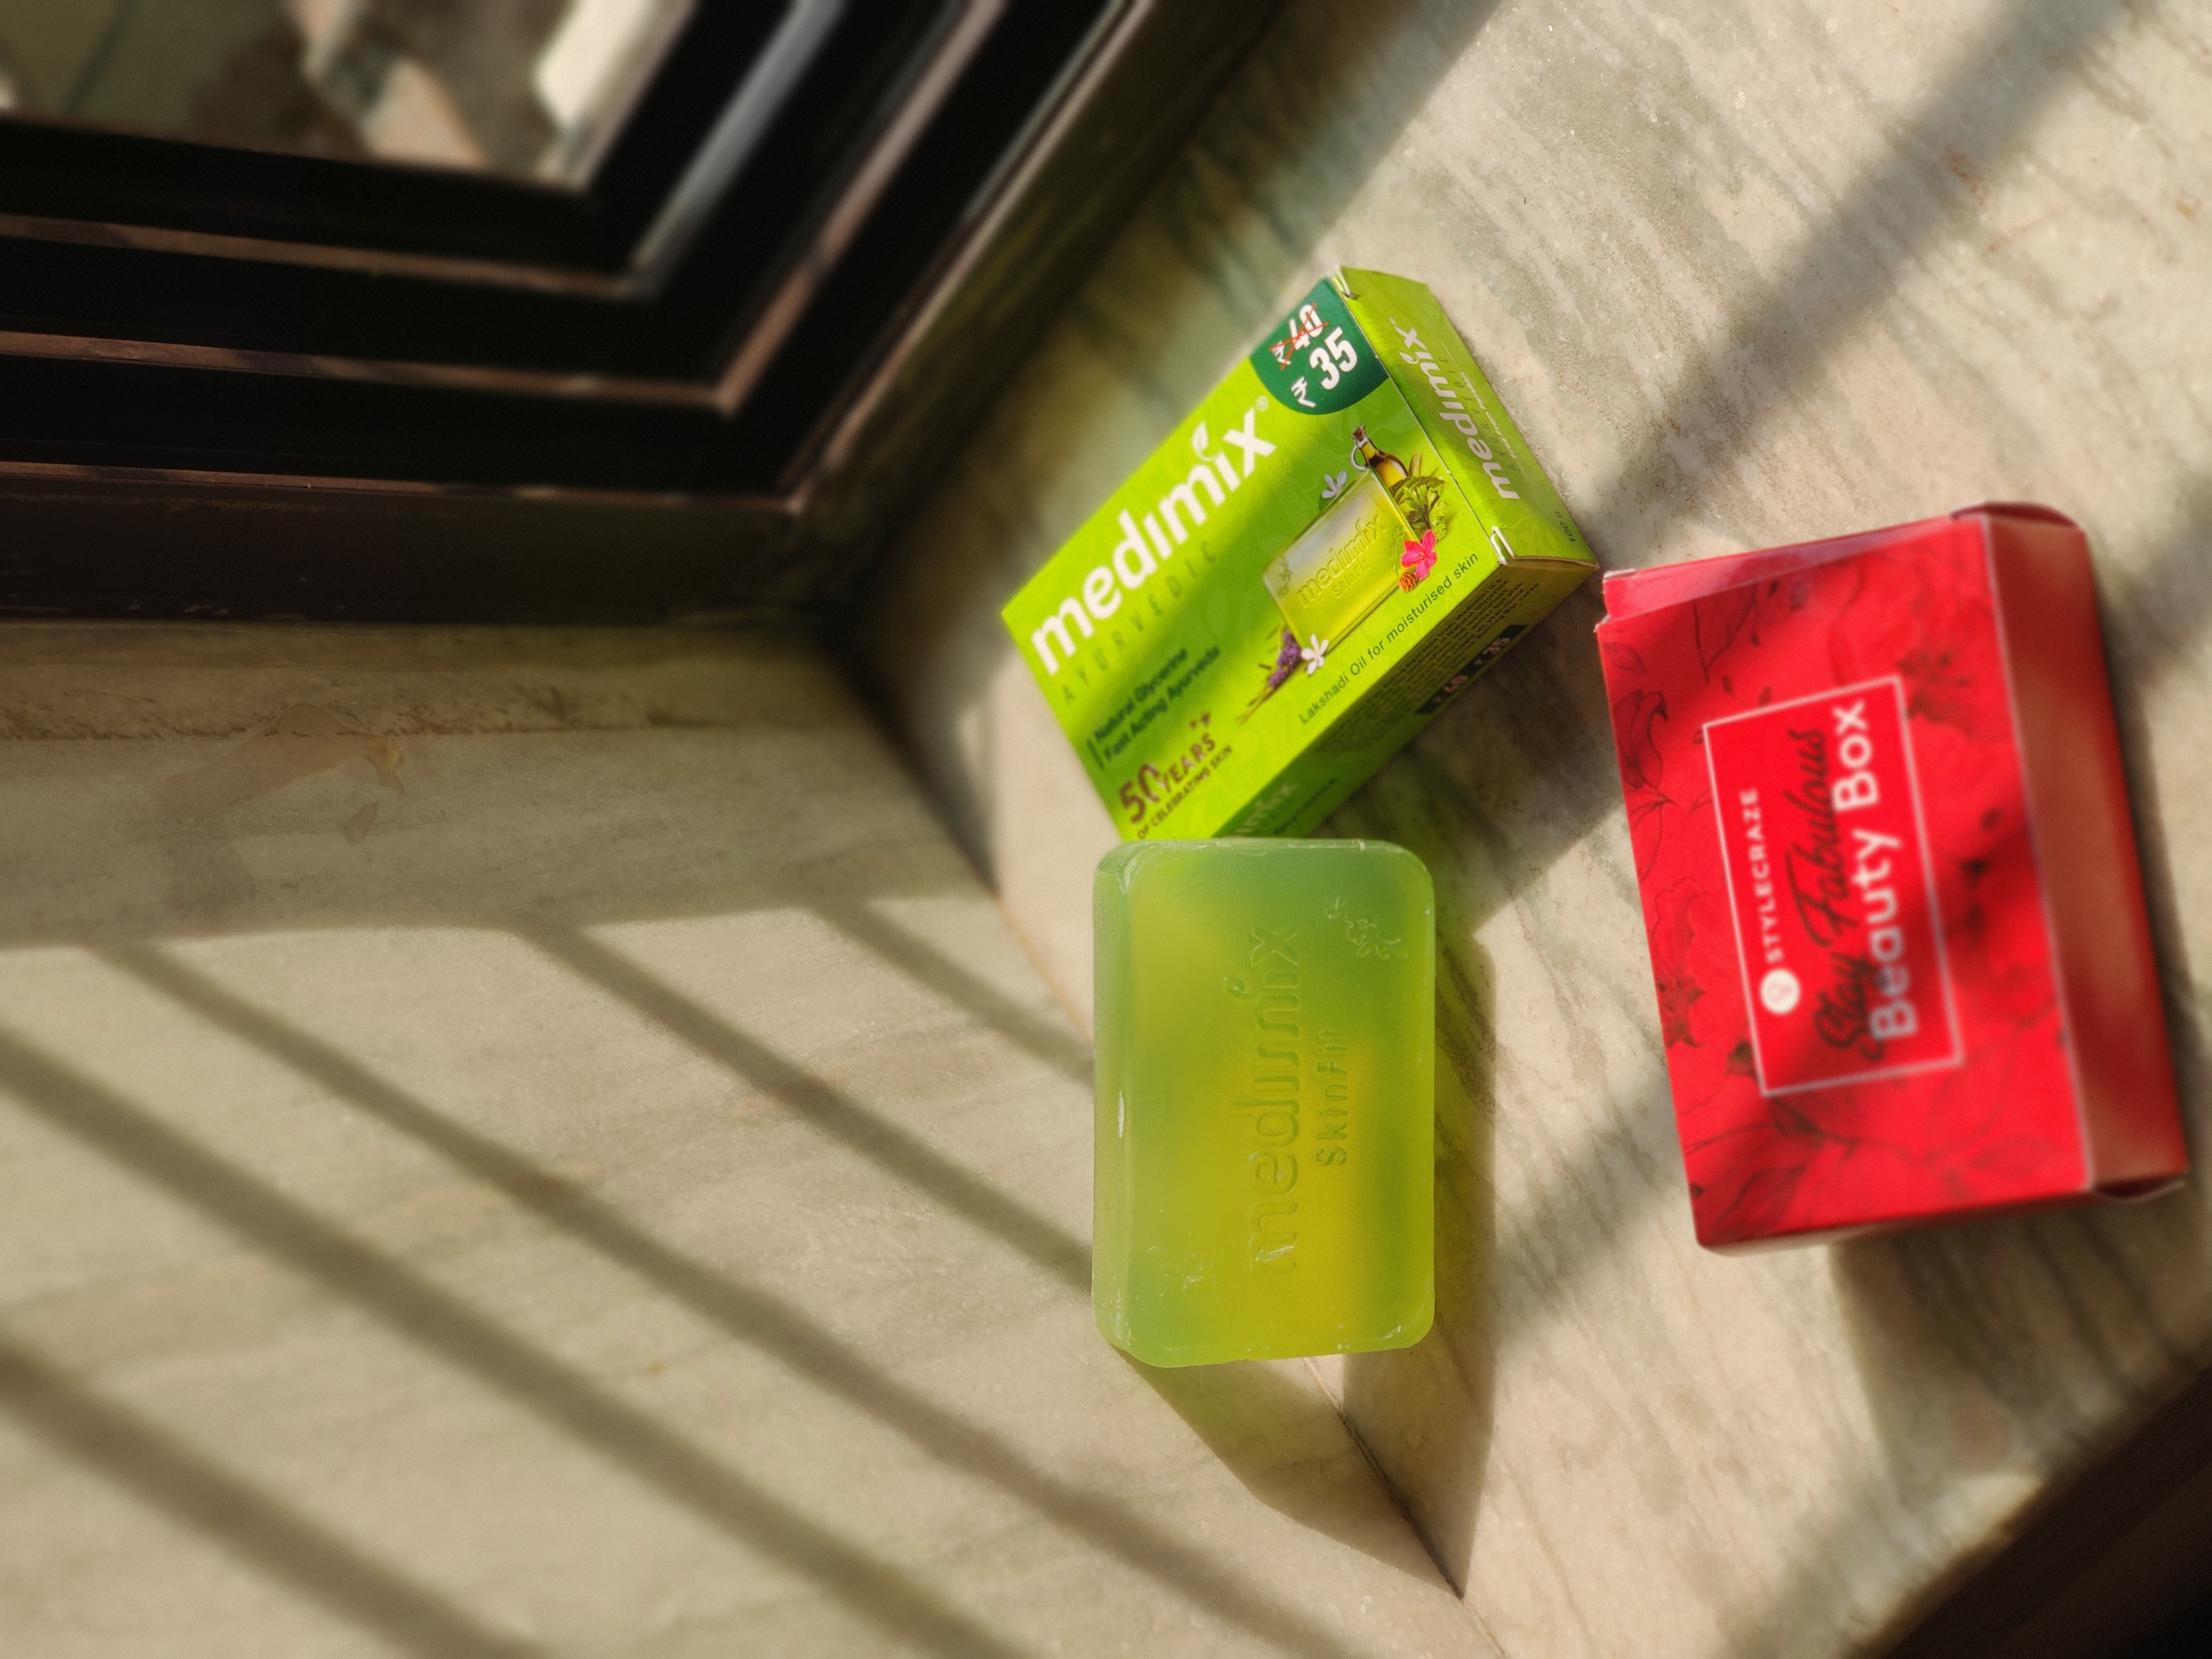 Medimix Ayurvedic Natural Glycerine soap with Lakshadi Oil pic 3-Natural Bathing Soap-By reviews_by_sheth